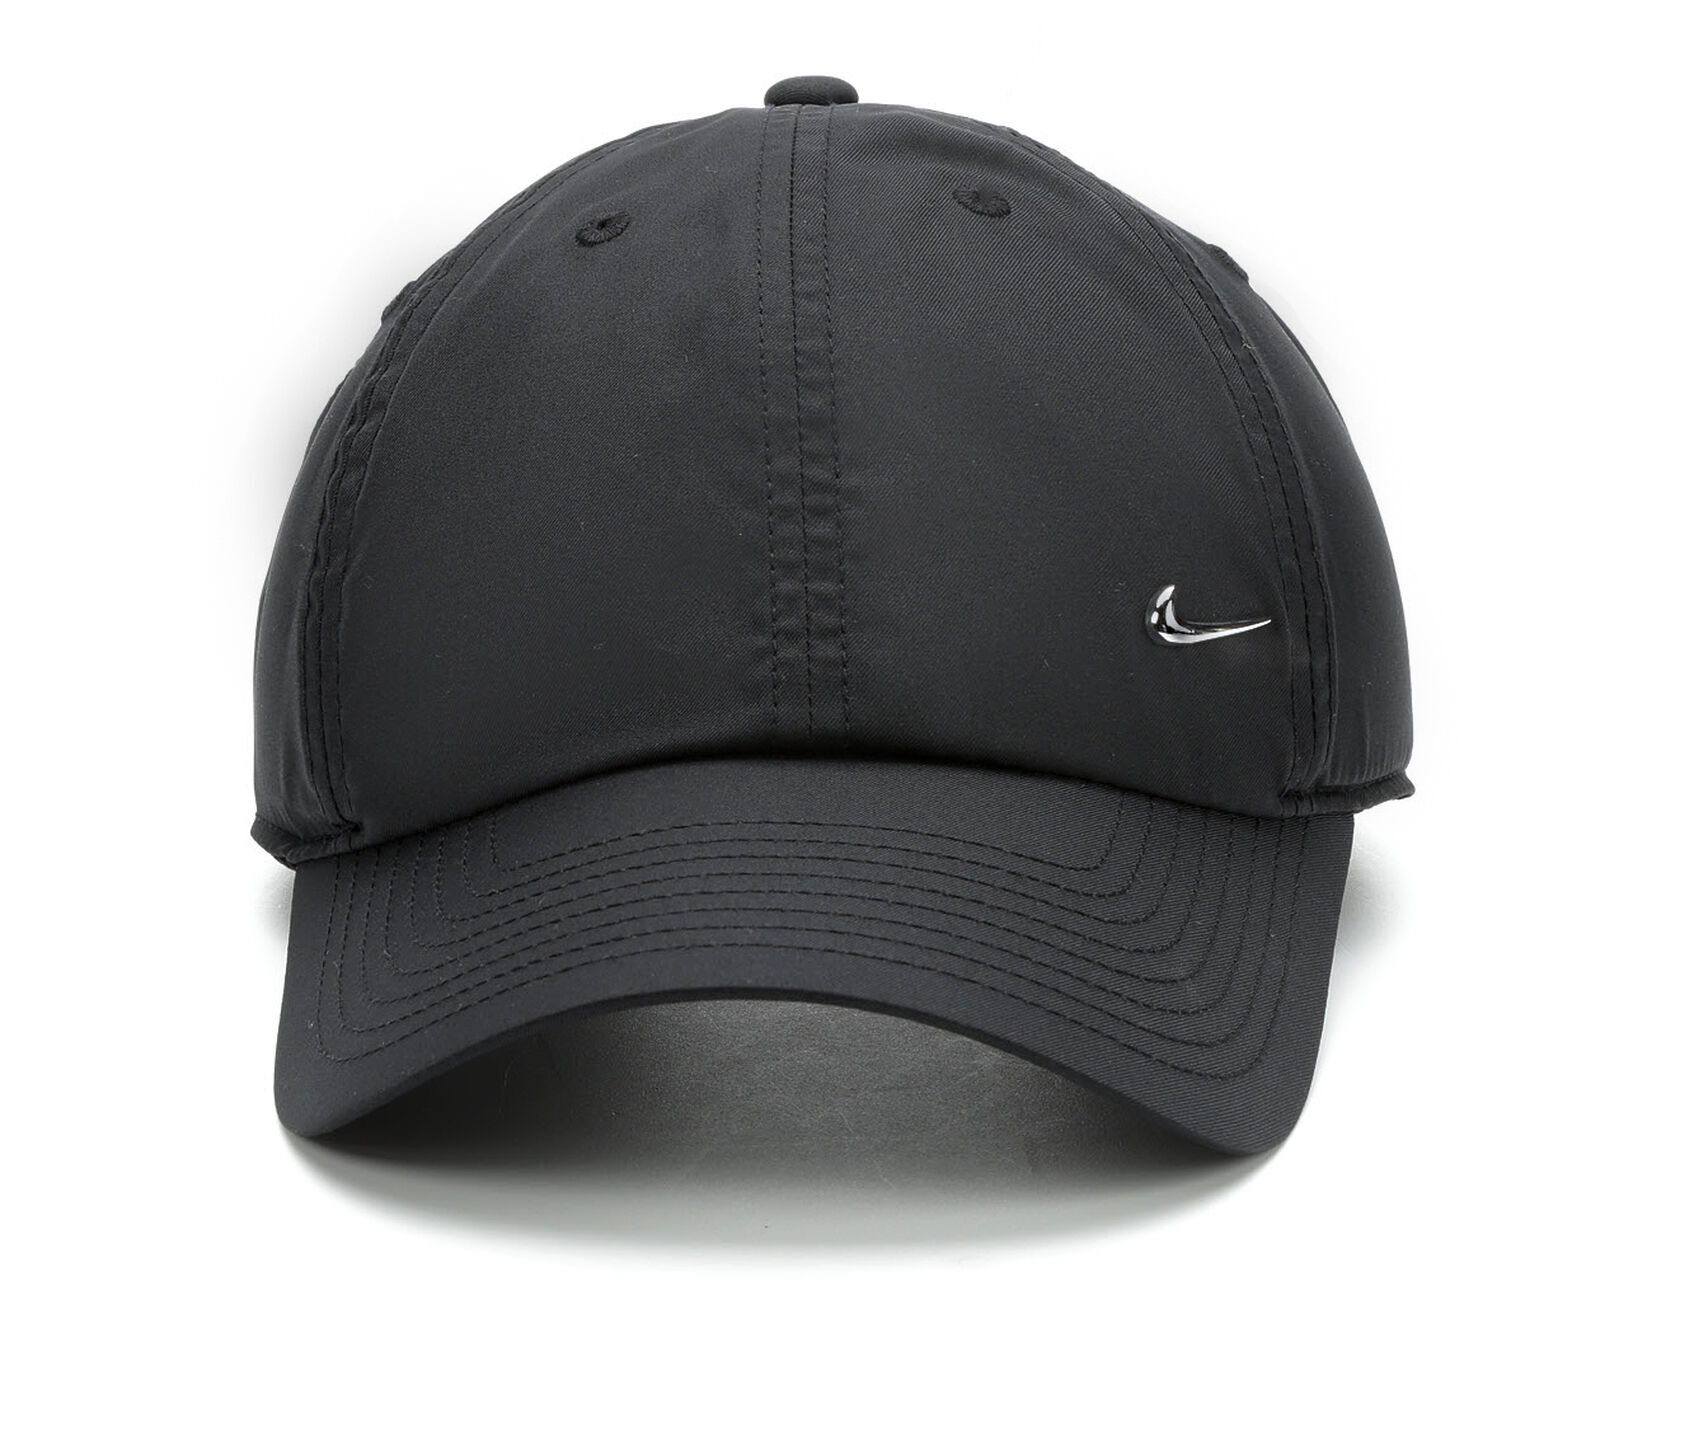 sale usa online shopping buy Nike Metallic Swoosh Cap